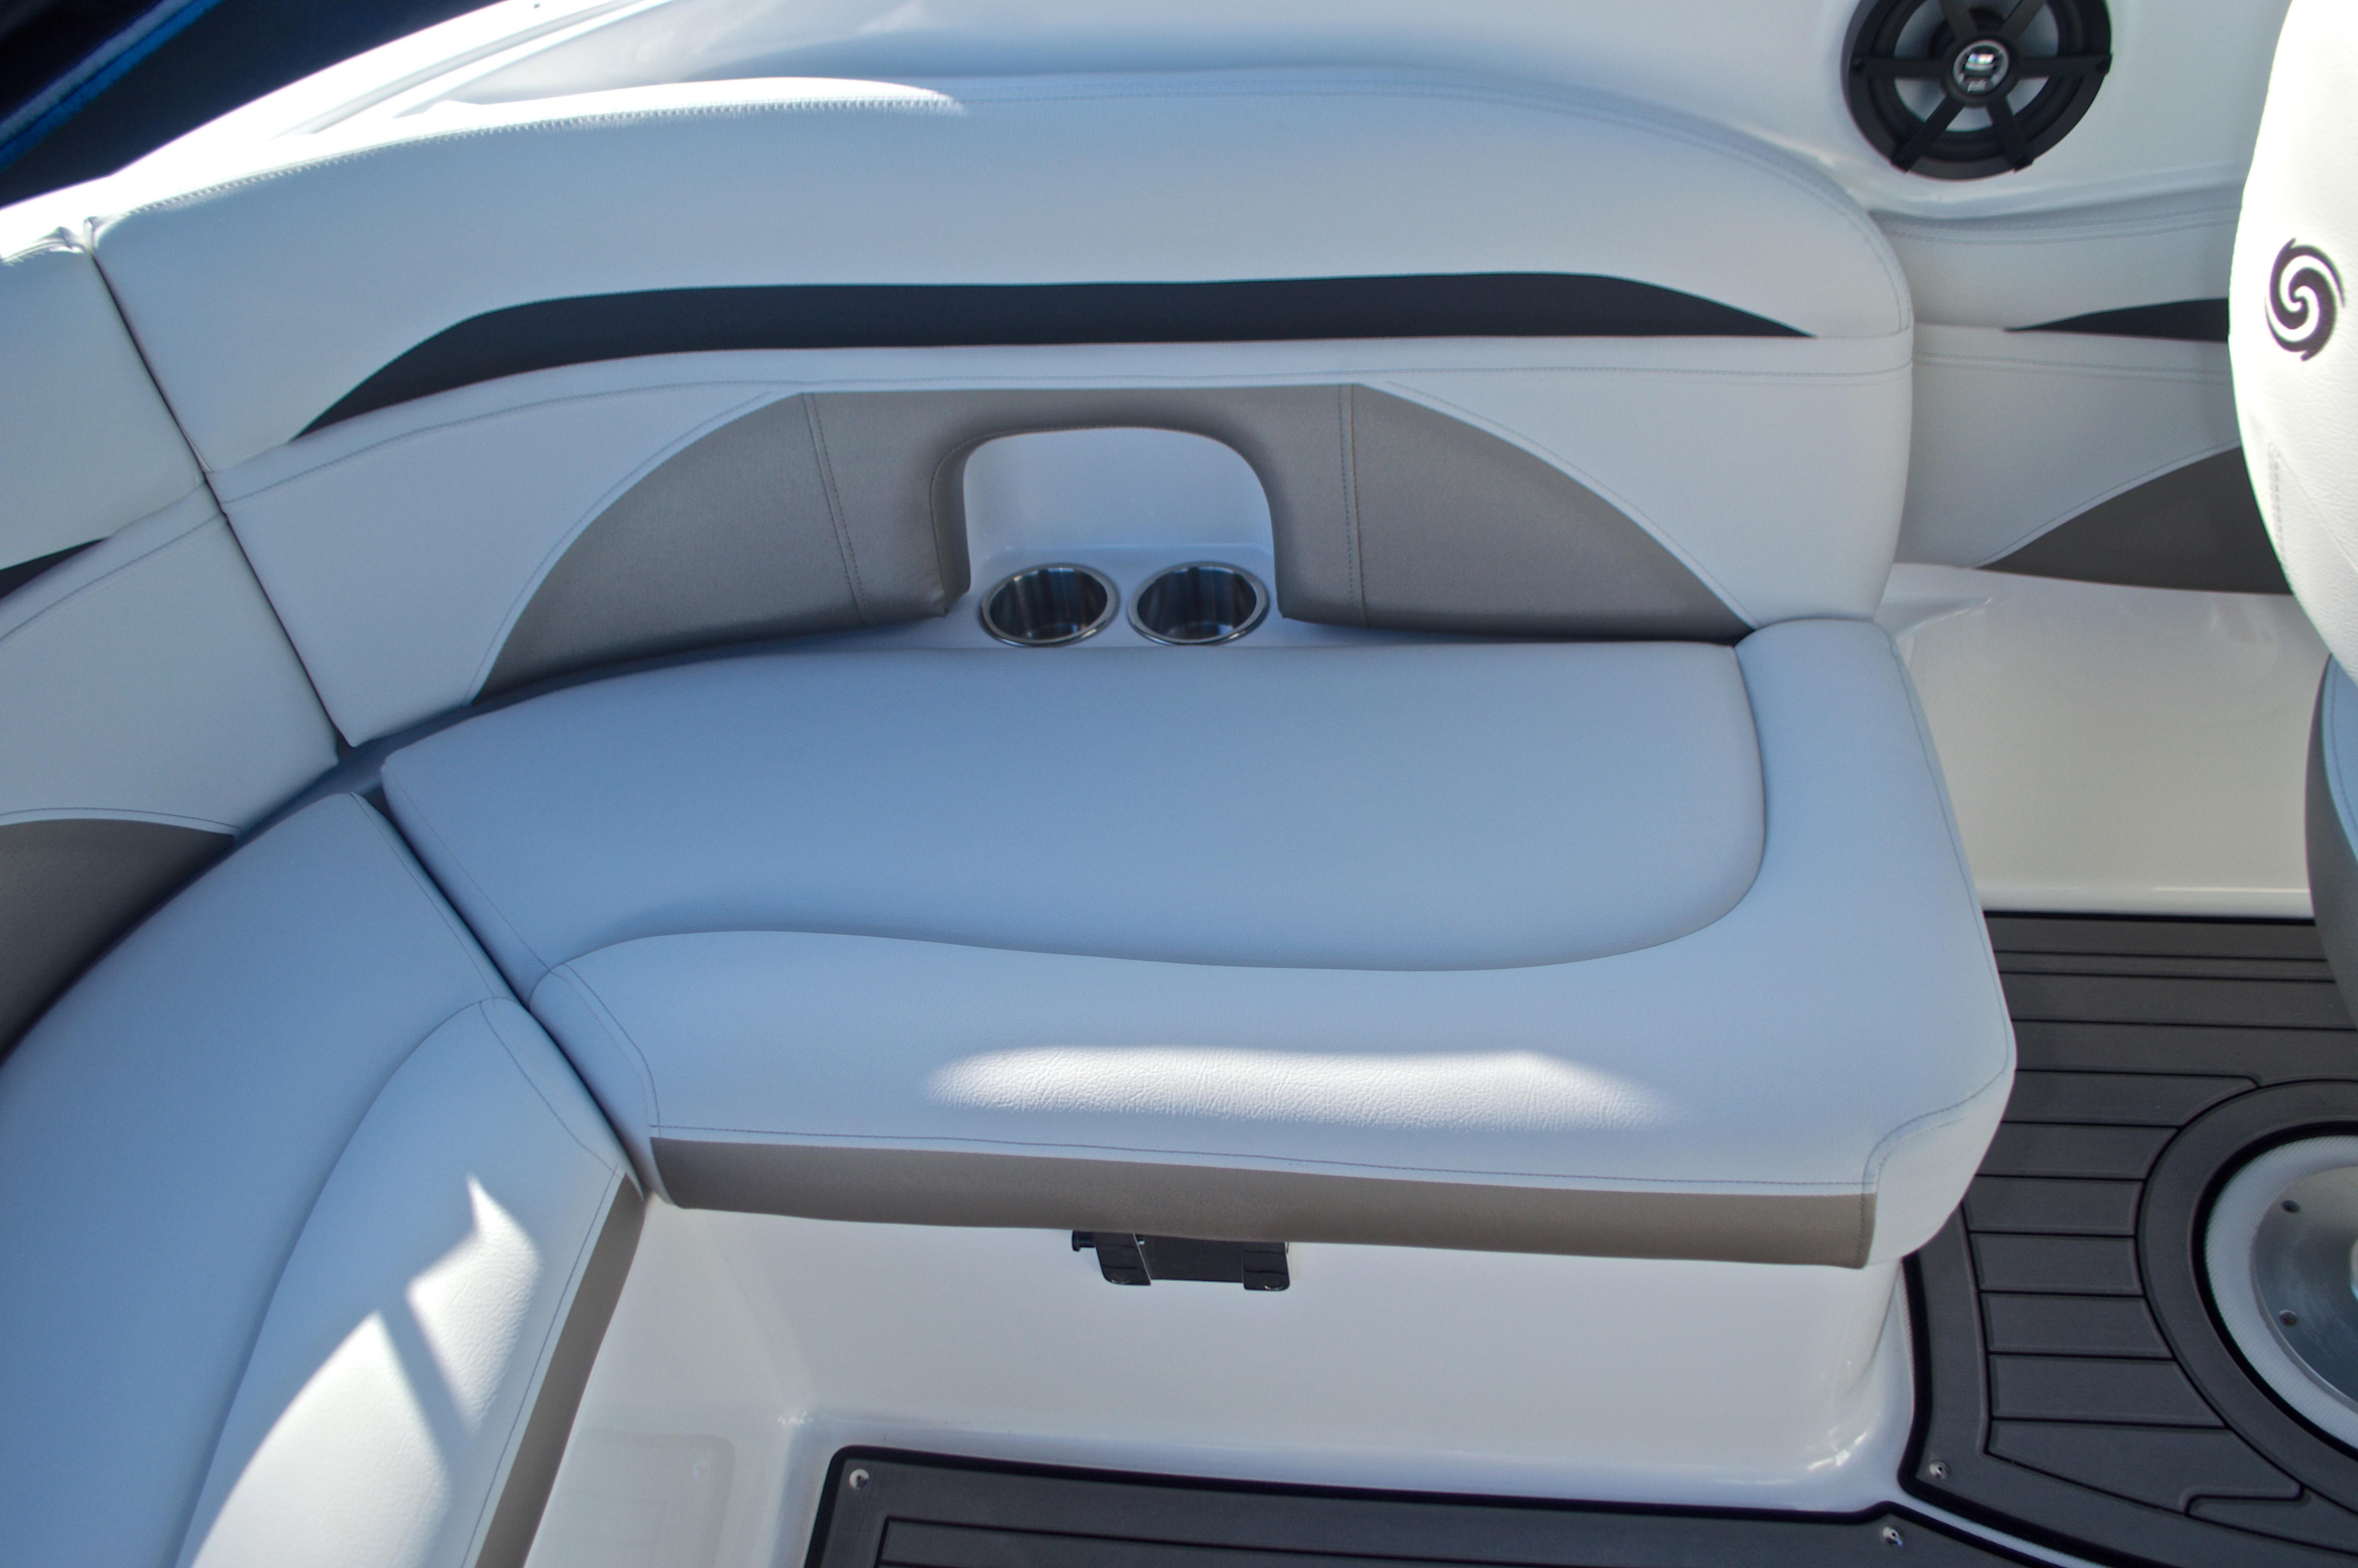 Thumbnail 32 for New 2017 Hurricane SunDeck SD 2400 OB boat for sale in Miami, FL